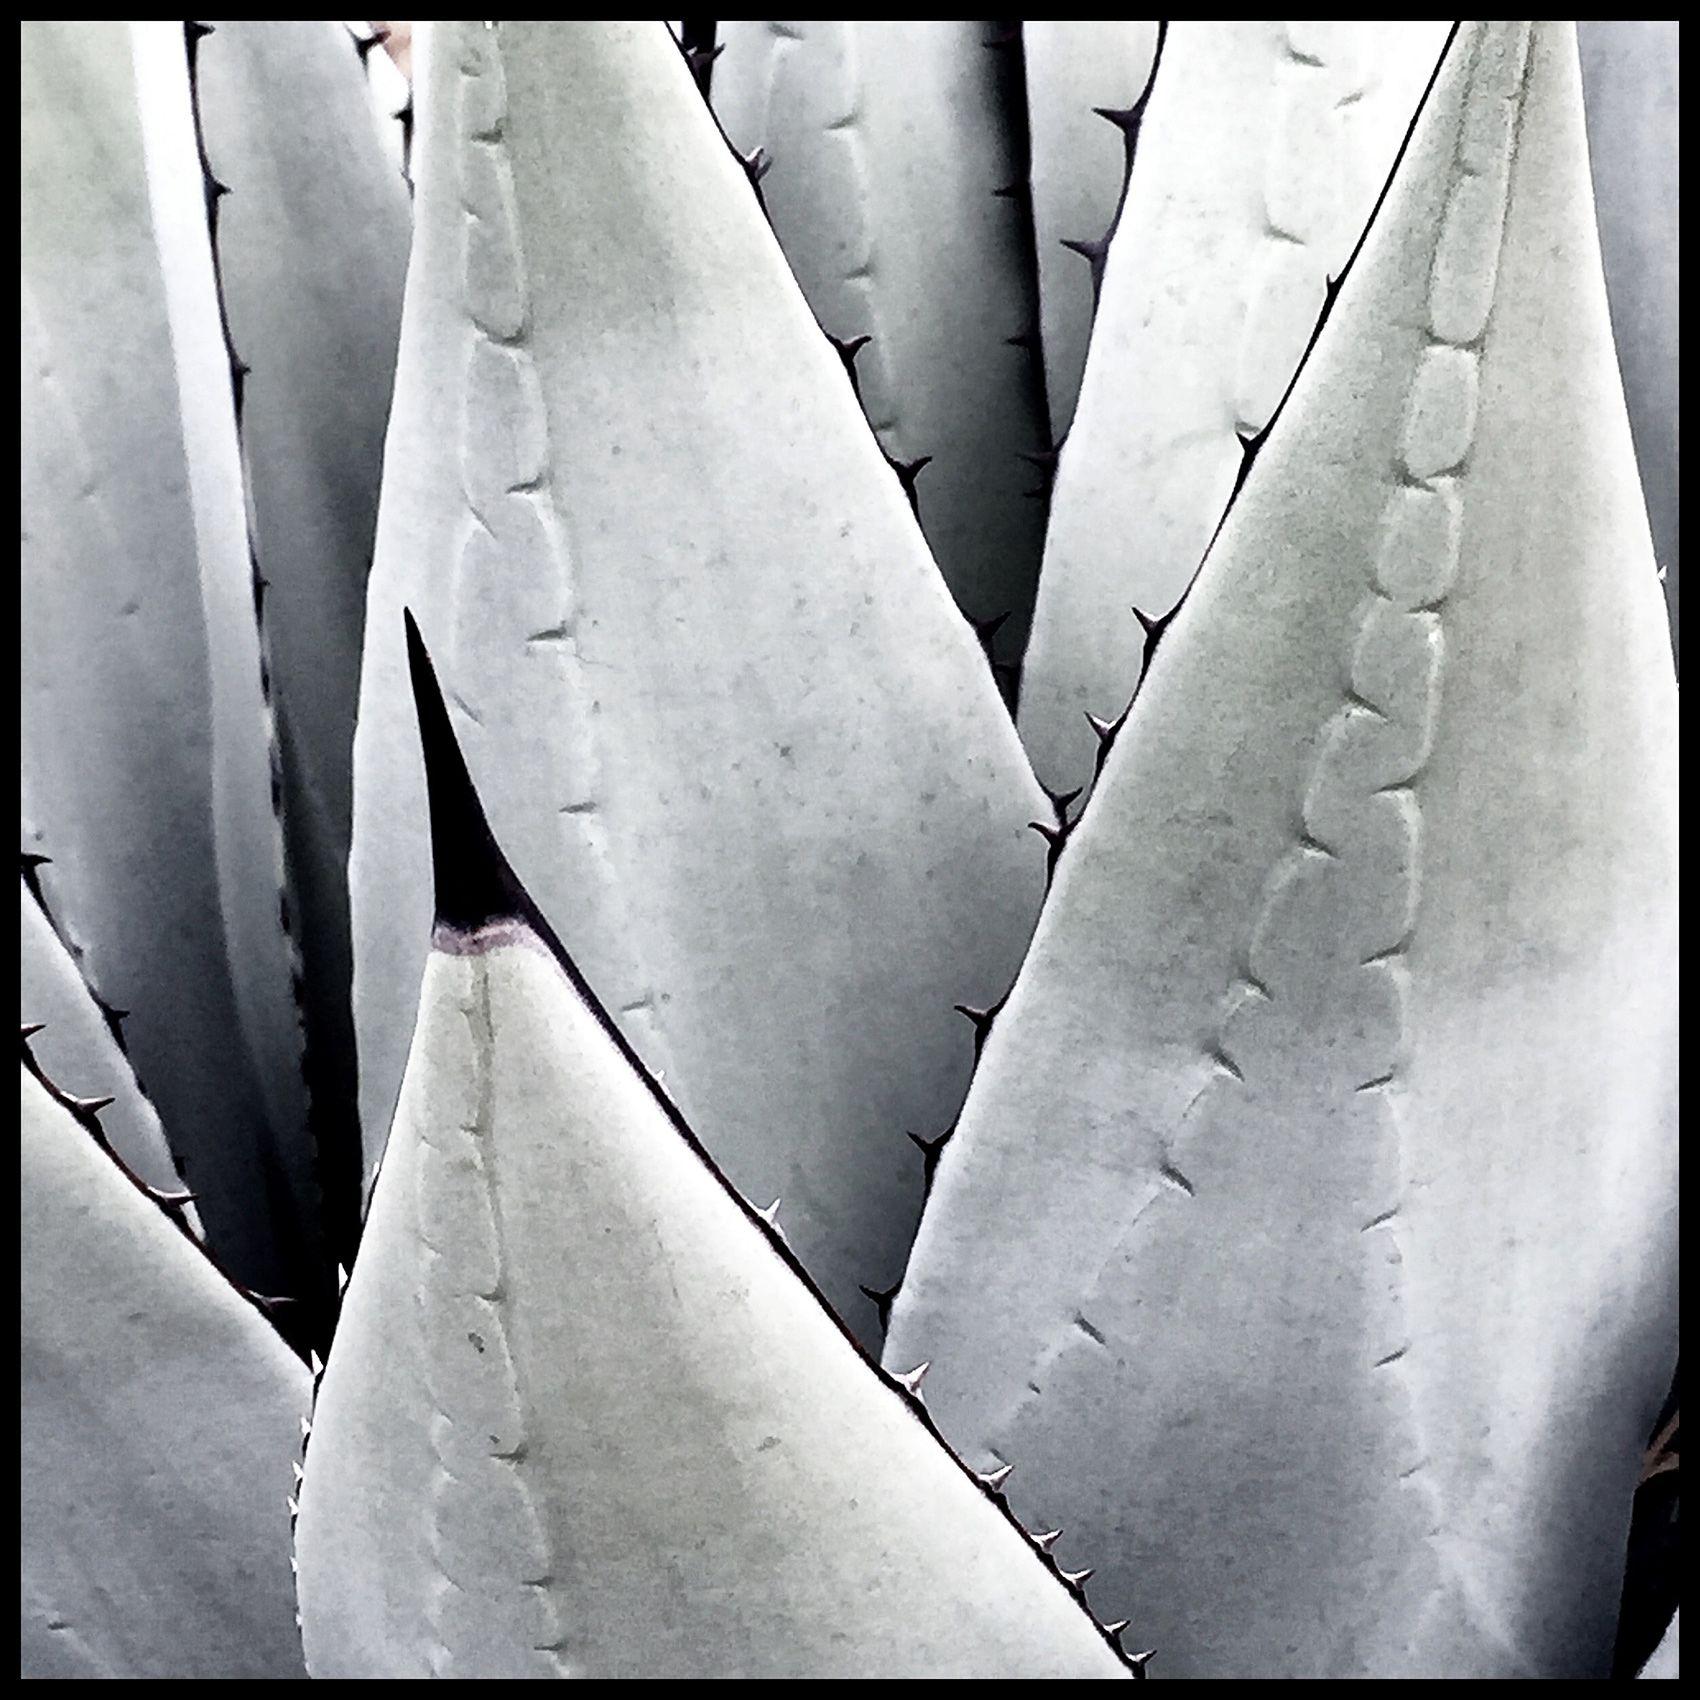 NewMexico_Cactus_Succulents.jpg